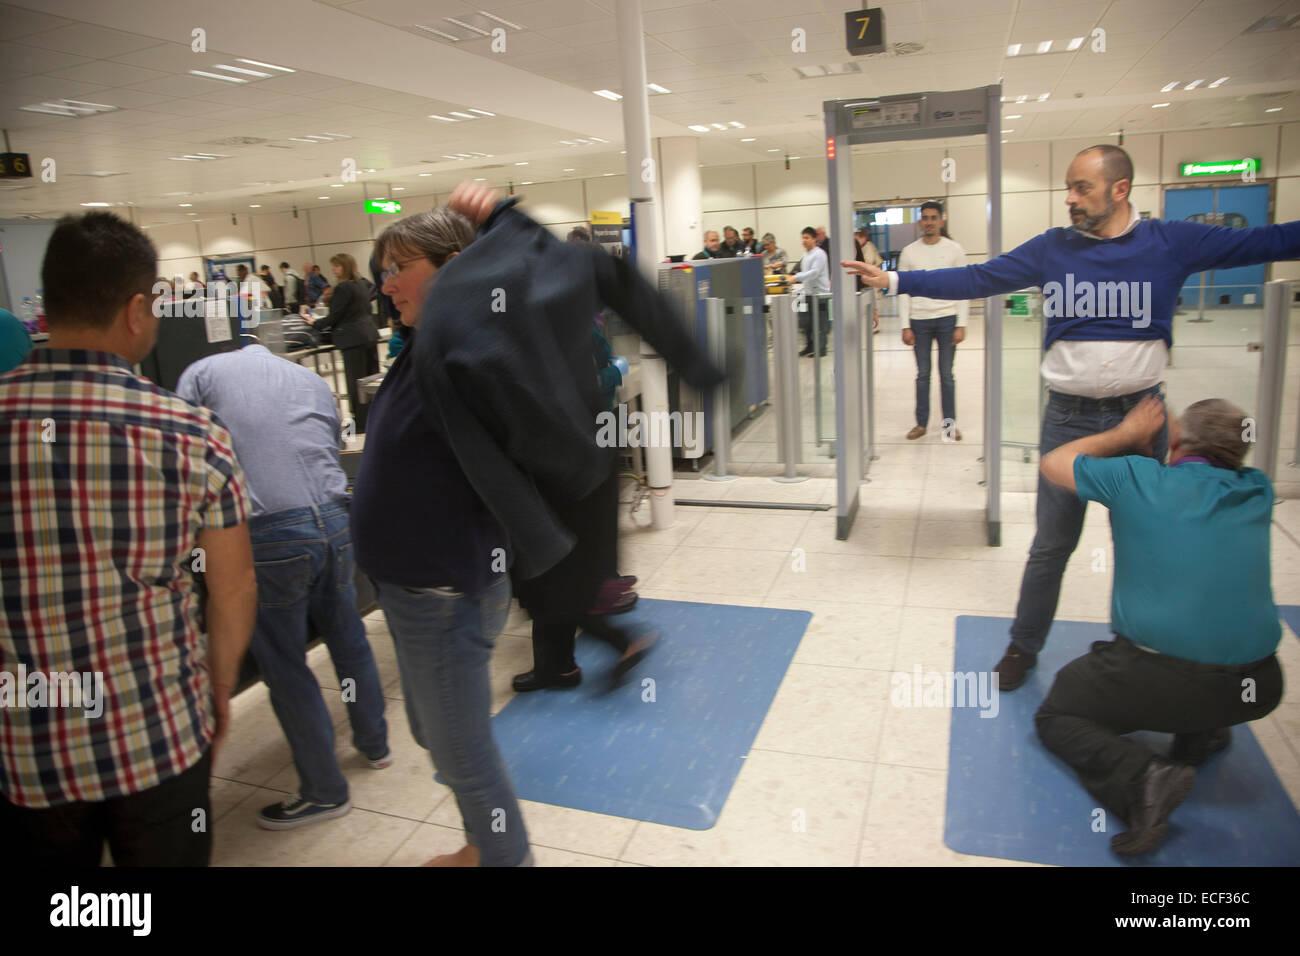 People passing through security screening at Gatwick airport, England, UK - Stock Image